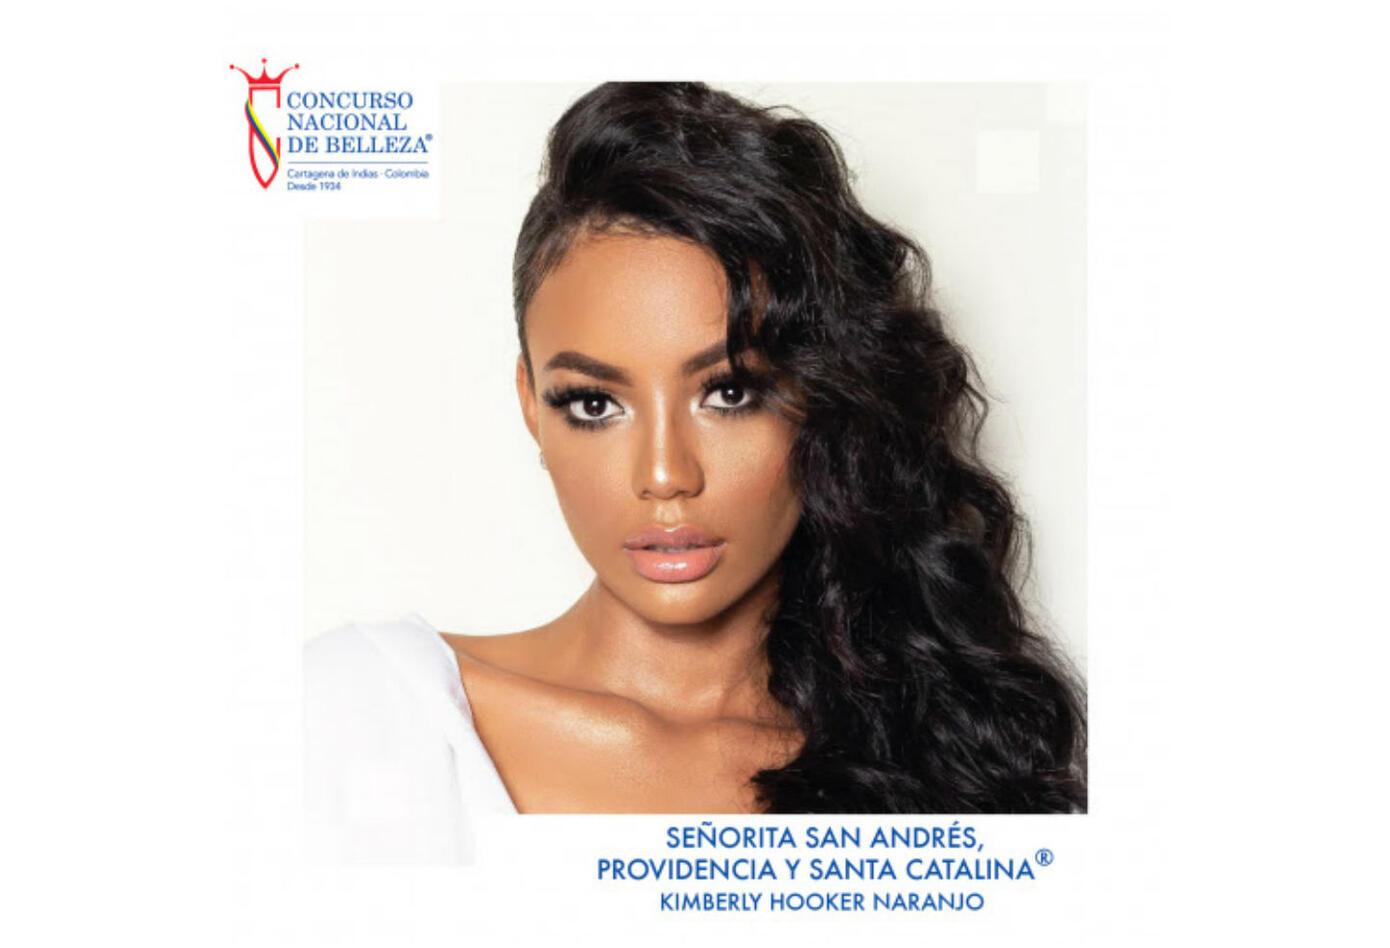 Kimberly Hooker, señorita San Andrés 2019